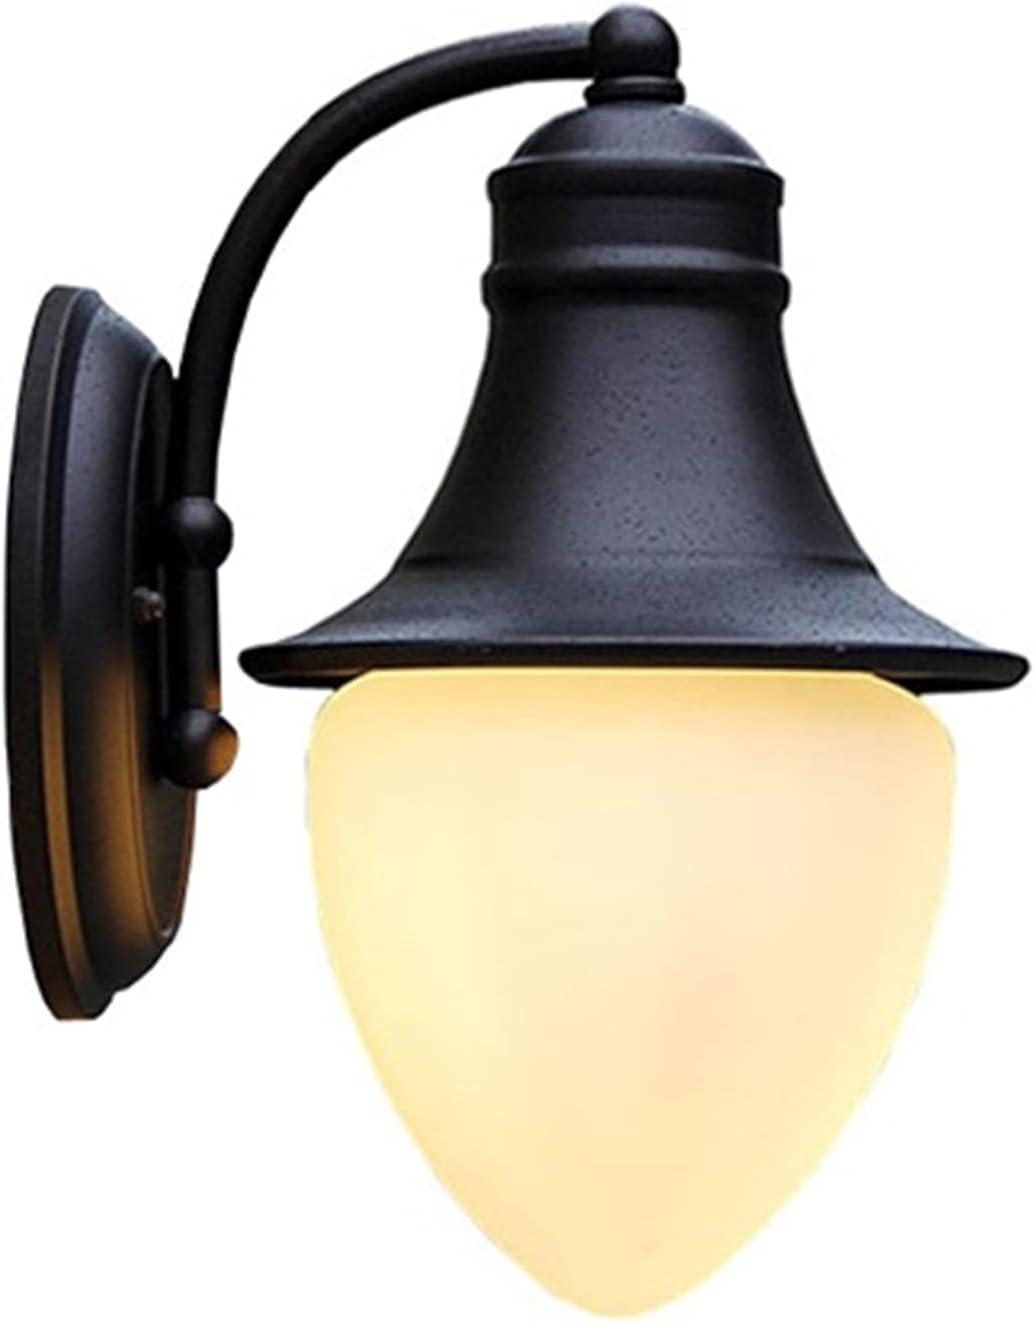 Industrial al aire libre impermeable lámpara de pared retro e27 fuente de luz de la luz de la cabeza de la cabeza de la cabeza de la cabeza de las luces montadas Luz de la pared Lámpara de lectura Lám